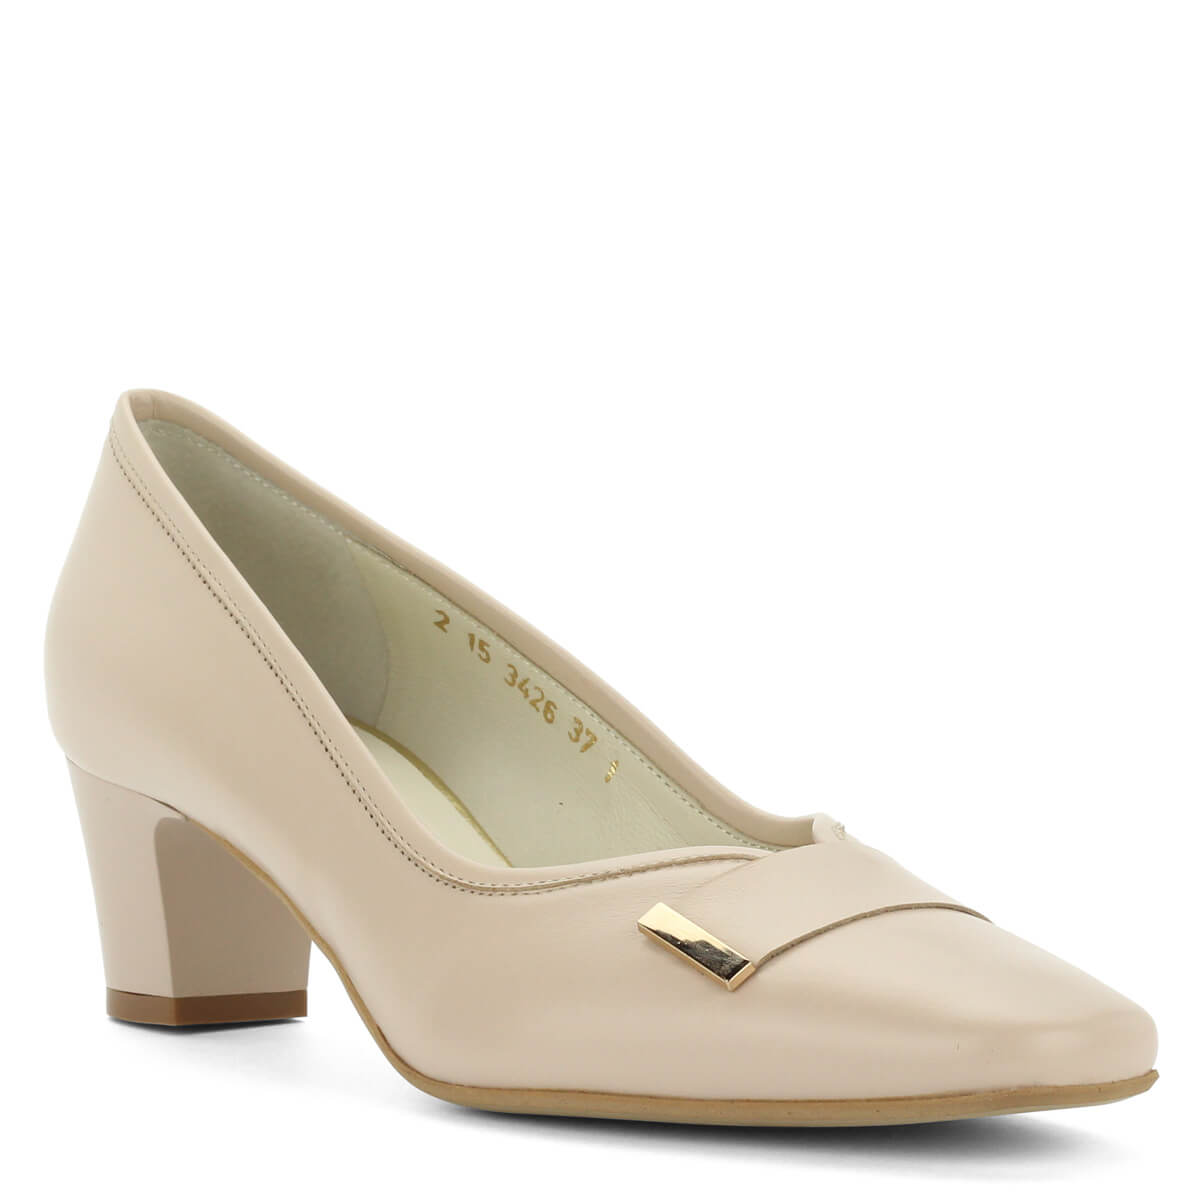 Kis sarkú bézs Anis bőr cipő. Kívül-belül bőr 73ac5ac931